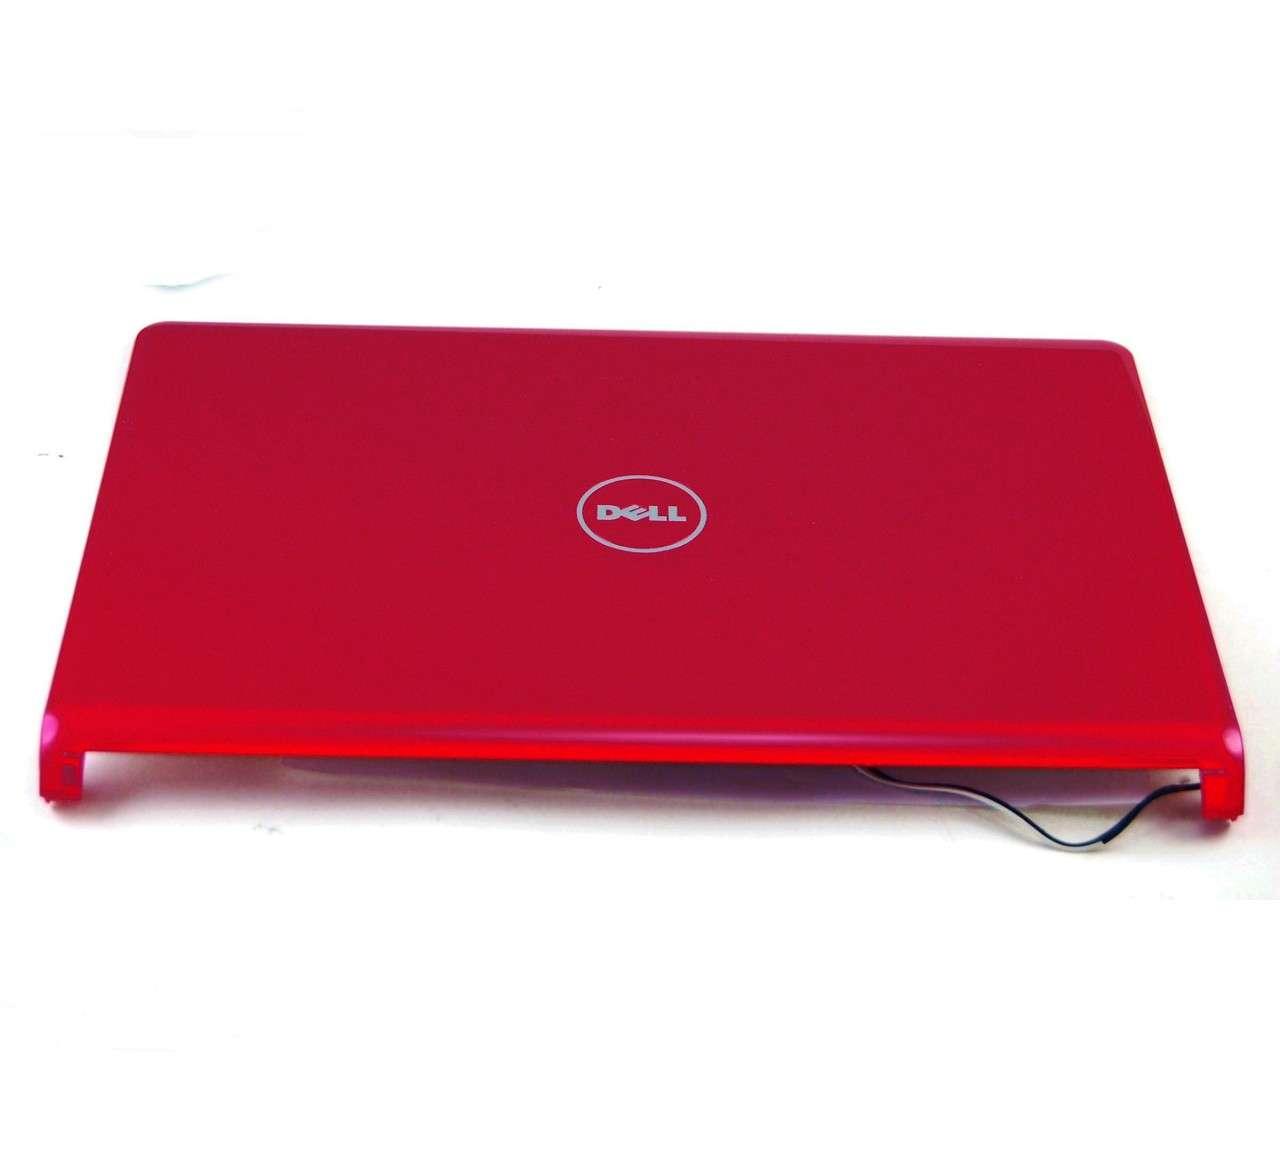 Capac Display BackCover Dell Inspiron 1564 Carcasa Display Rosu imagine powerlaptop.ro 2021